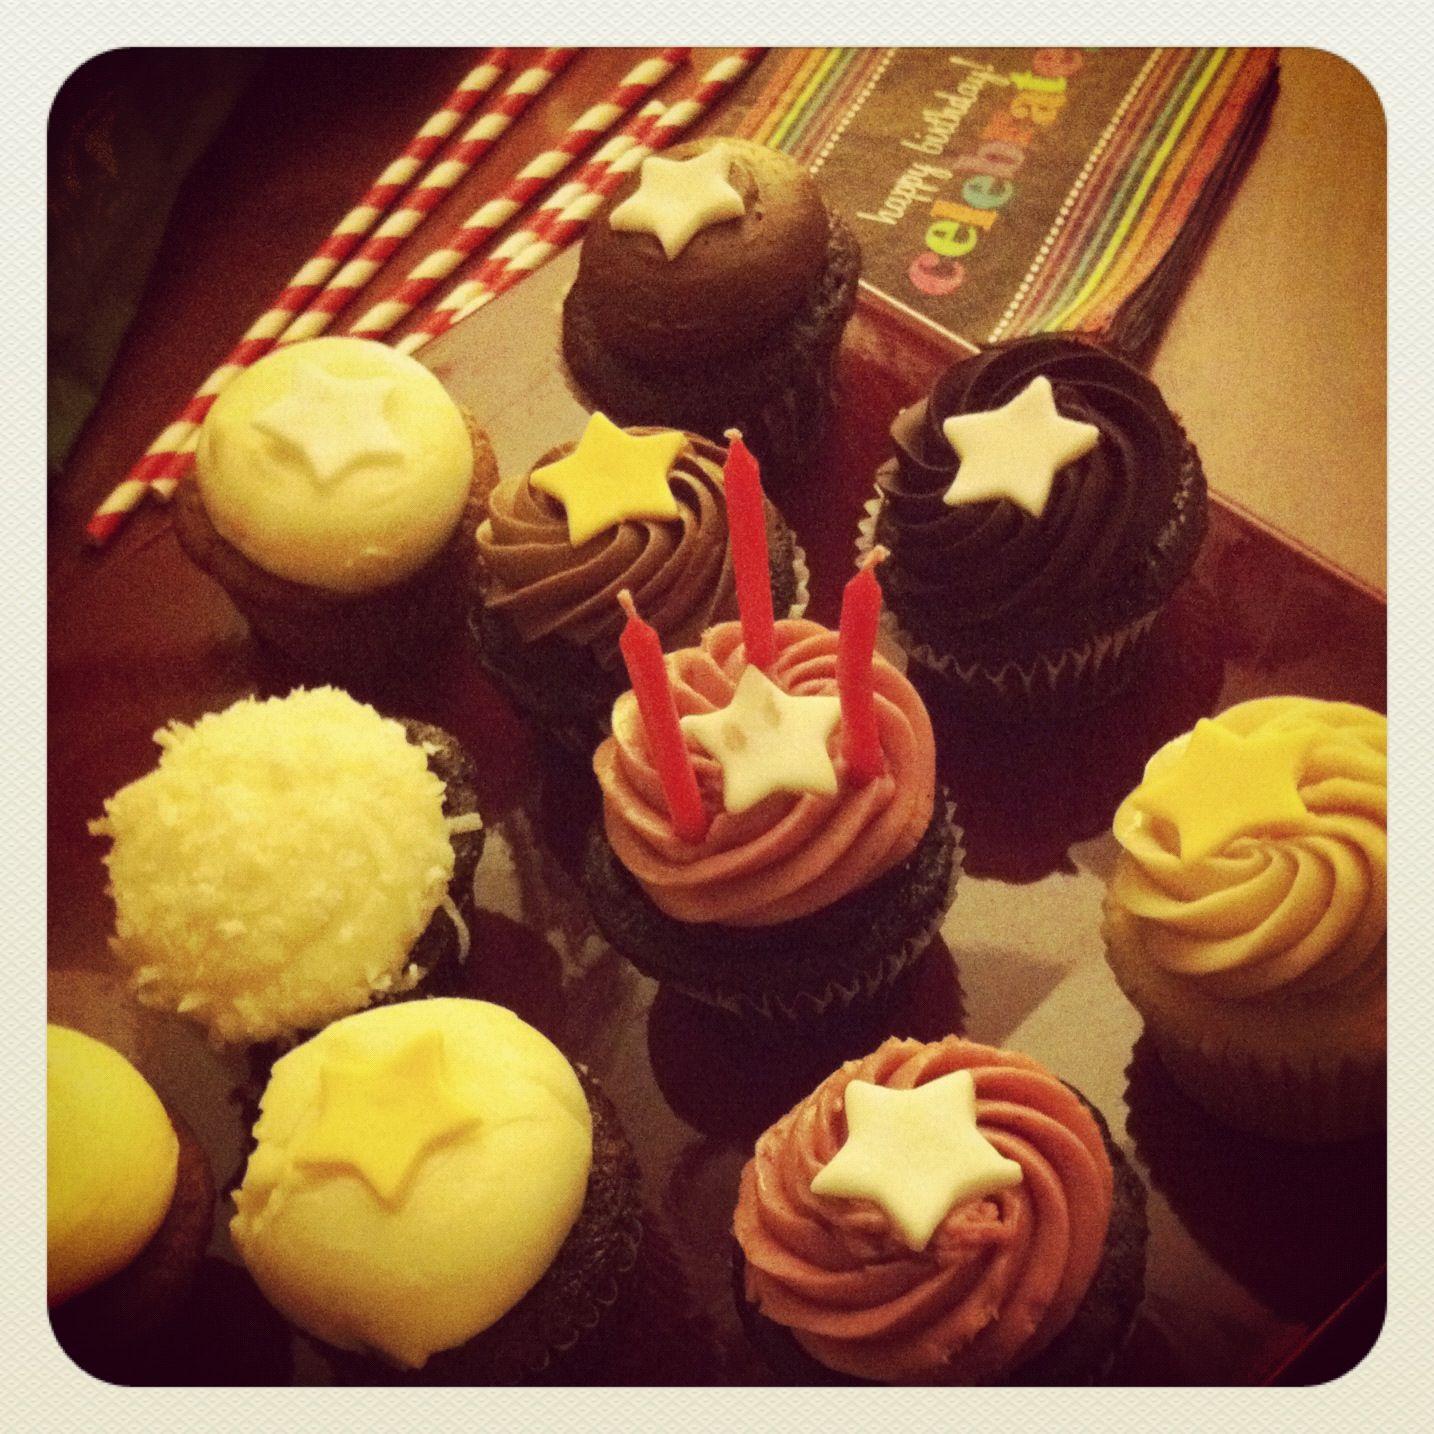 Kara's Cupcakes, Ghirardelli Square